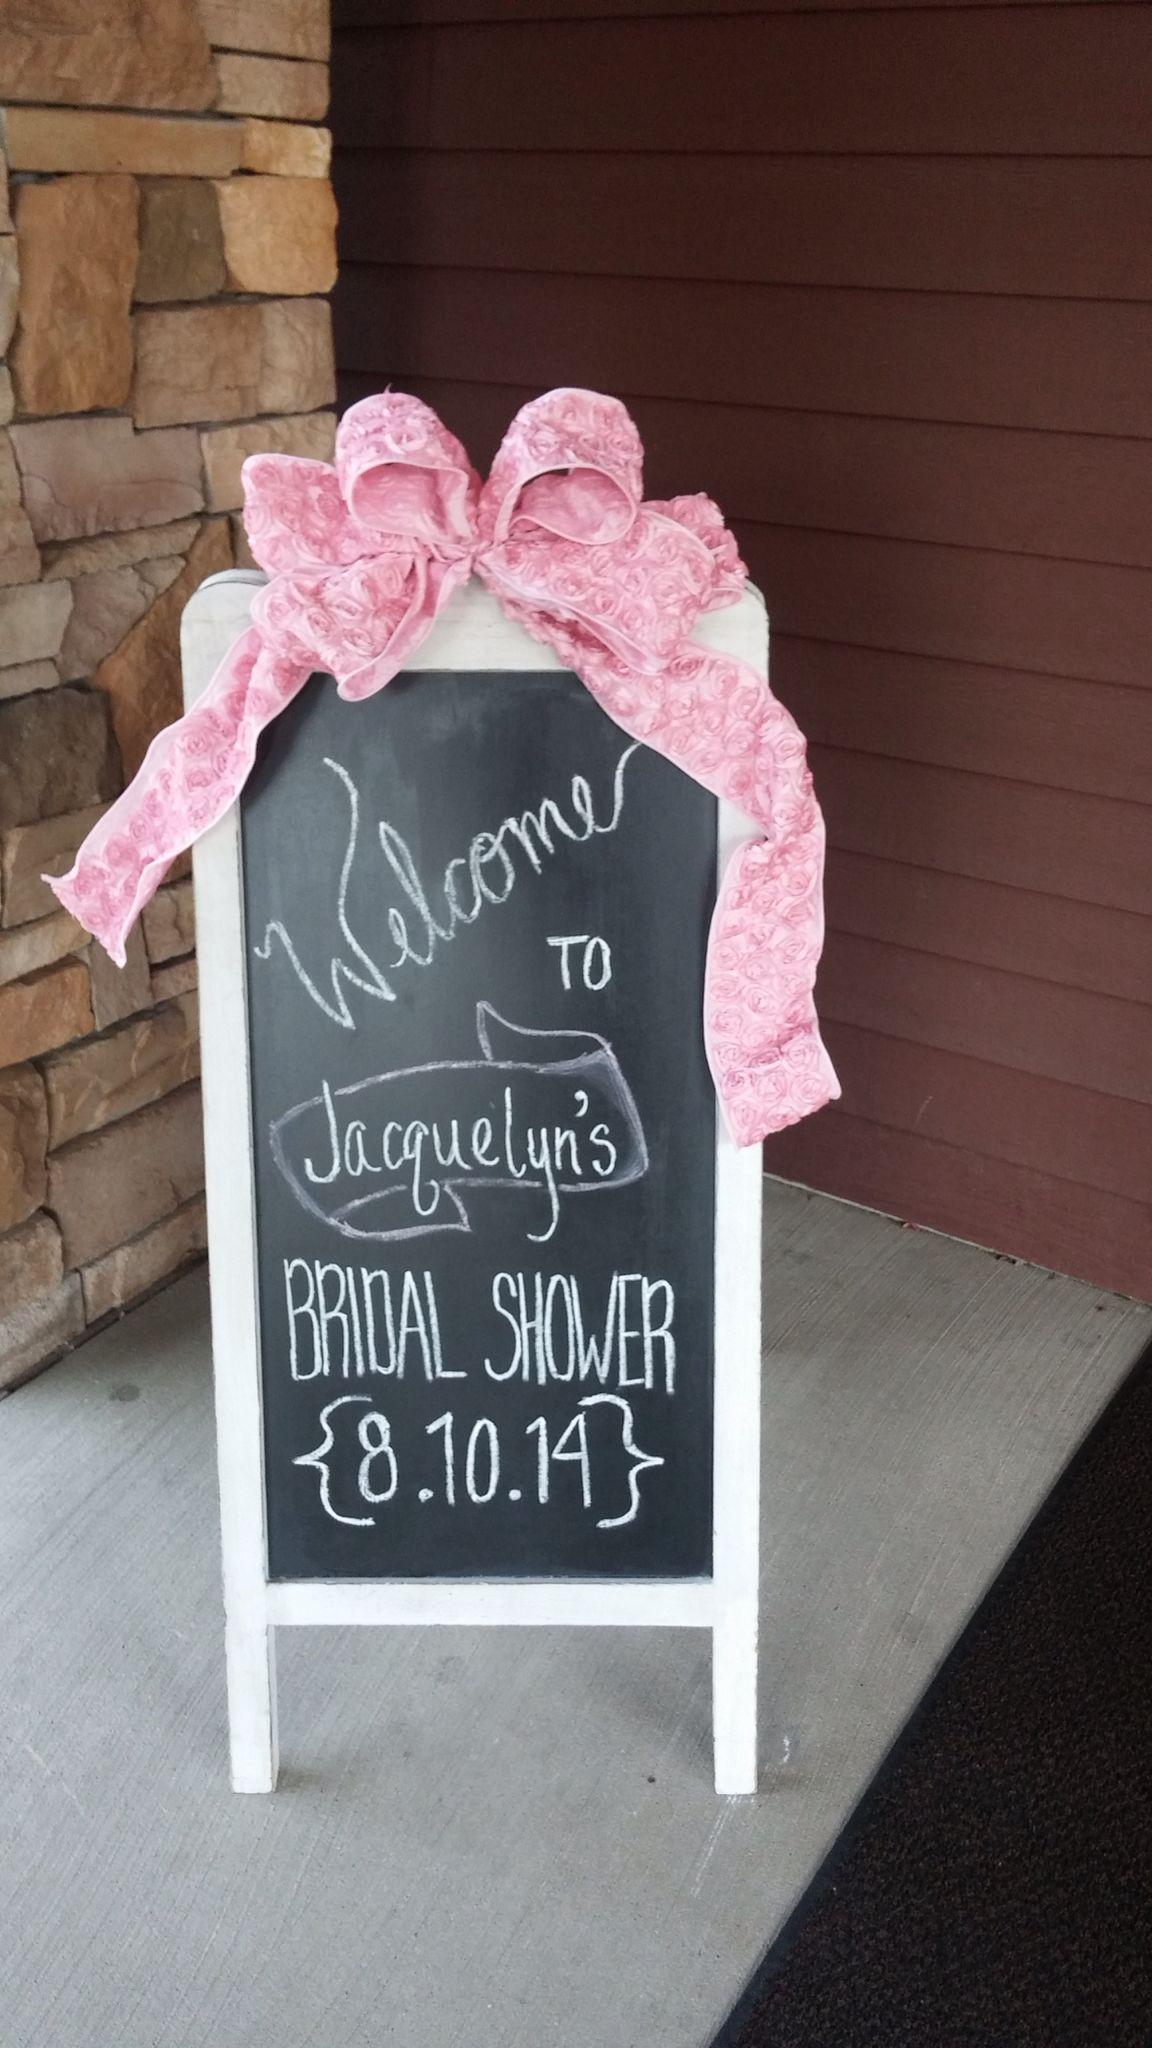 8-10-14 Jacquelyn's bridal shower